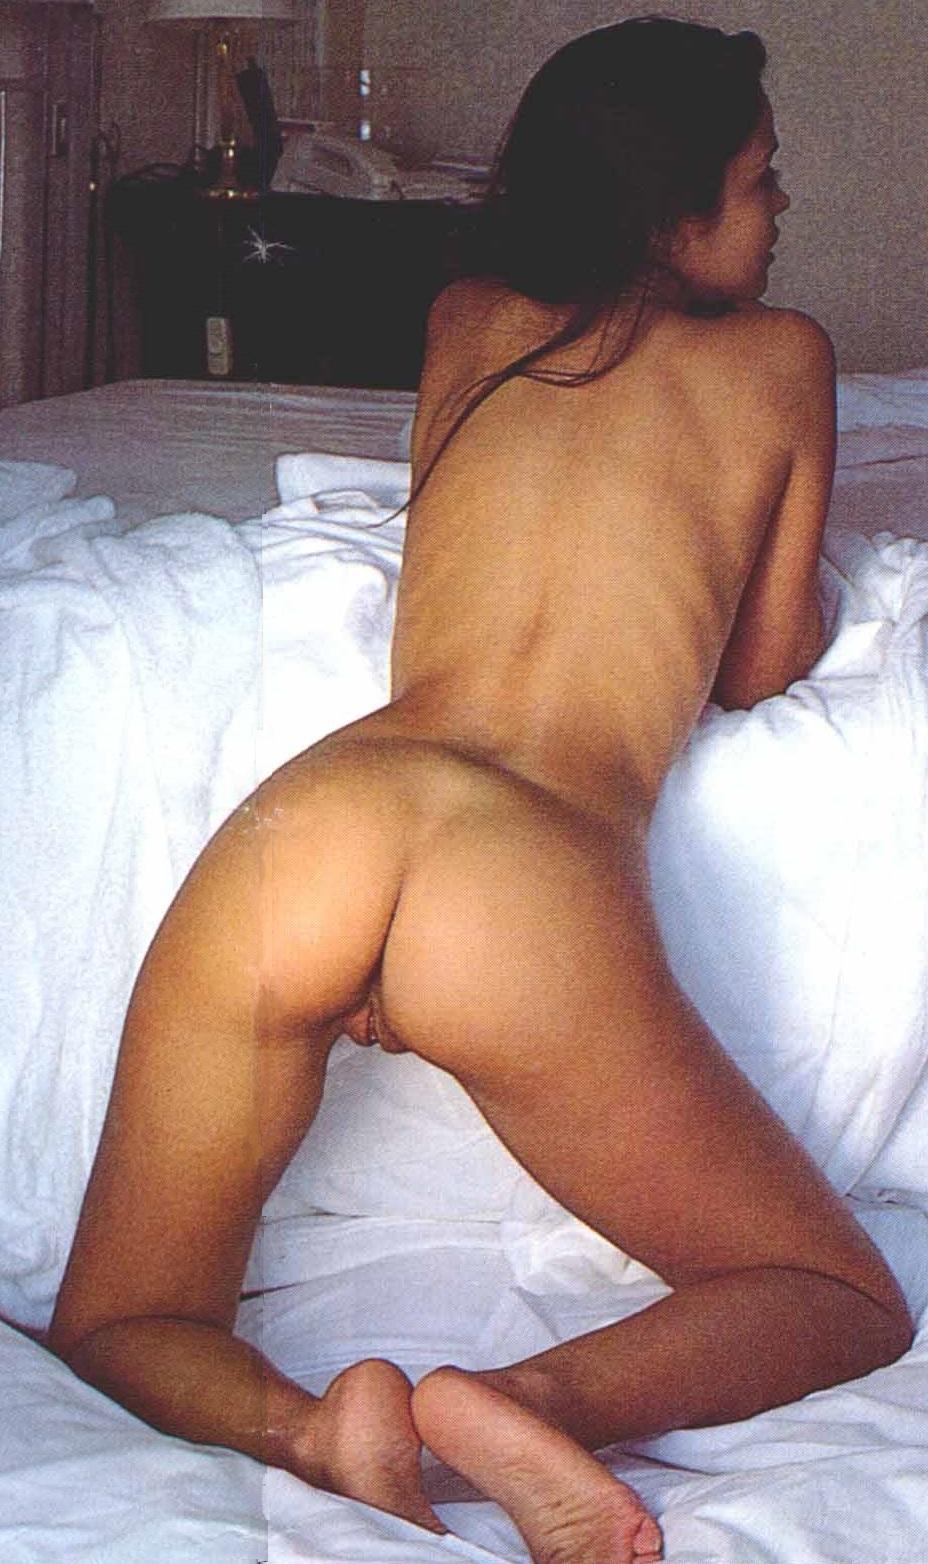 jolis seins nus meilleur jeu porno